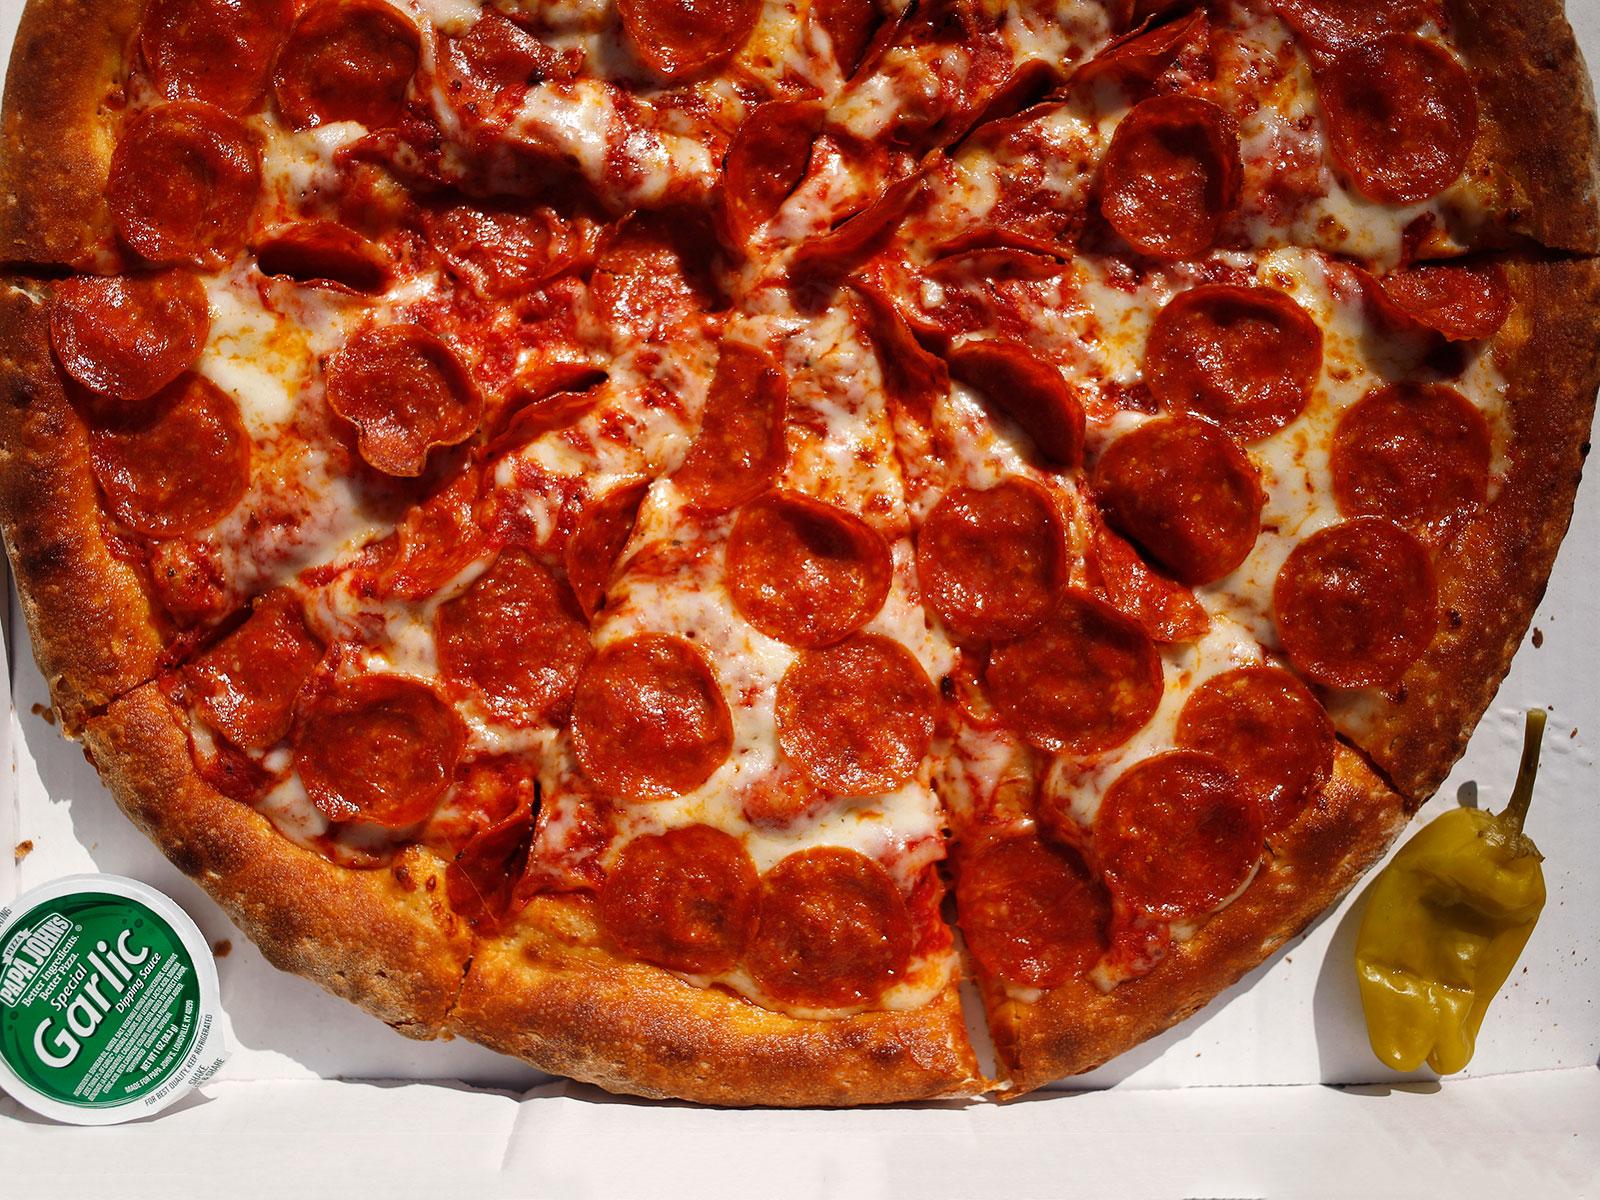 Papa John's New Gluten-Free Pizza Isn't Celiac-Approved